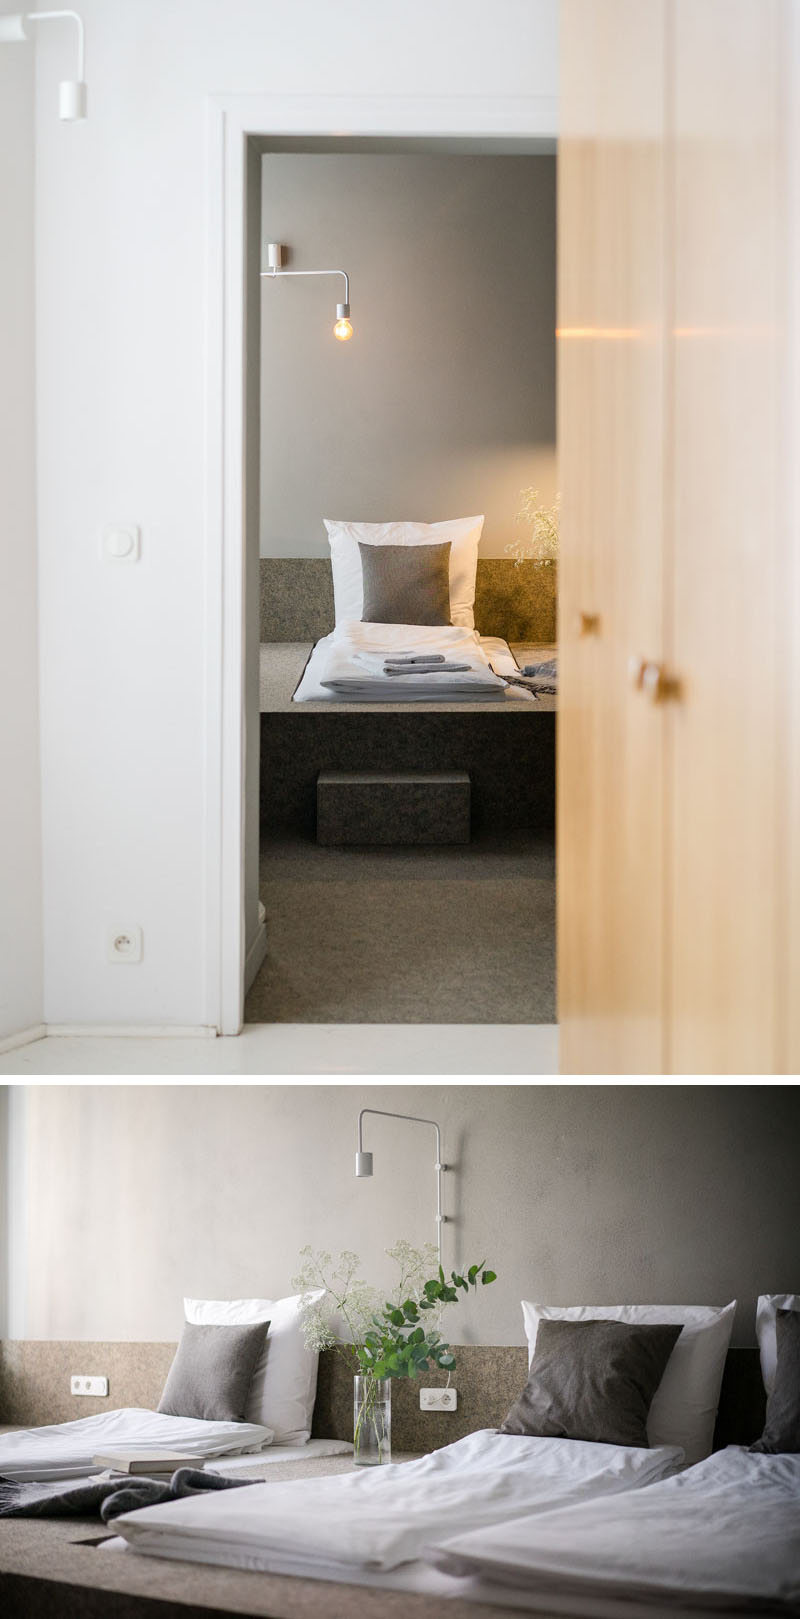 built-in-bed-191216-1037-03